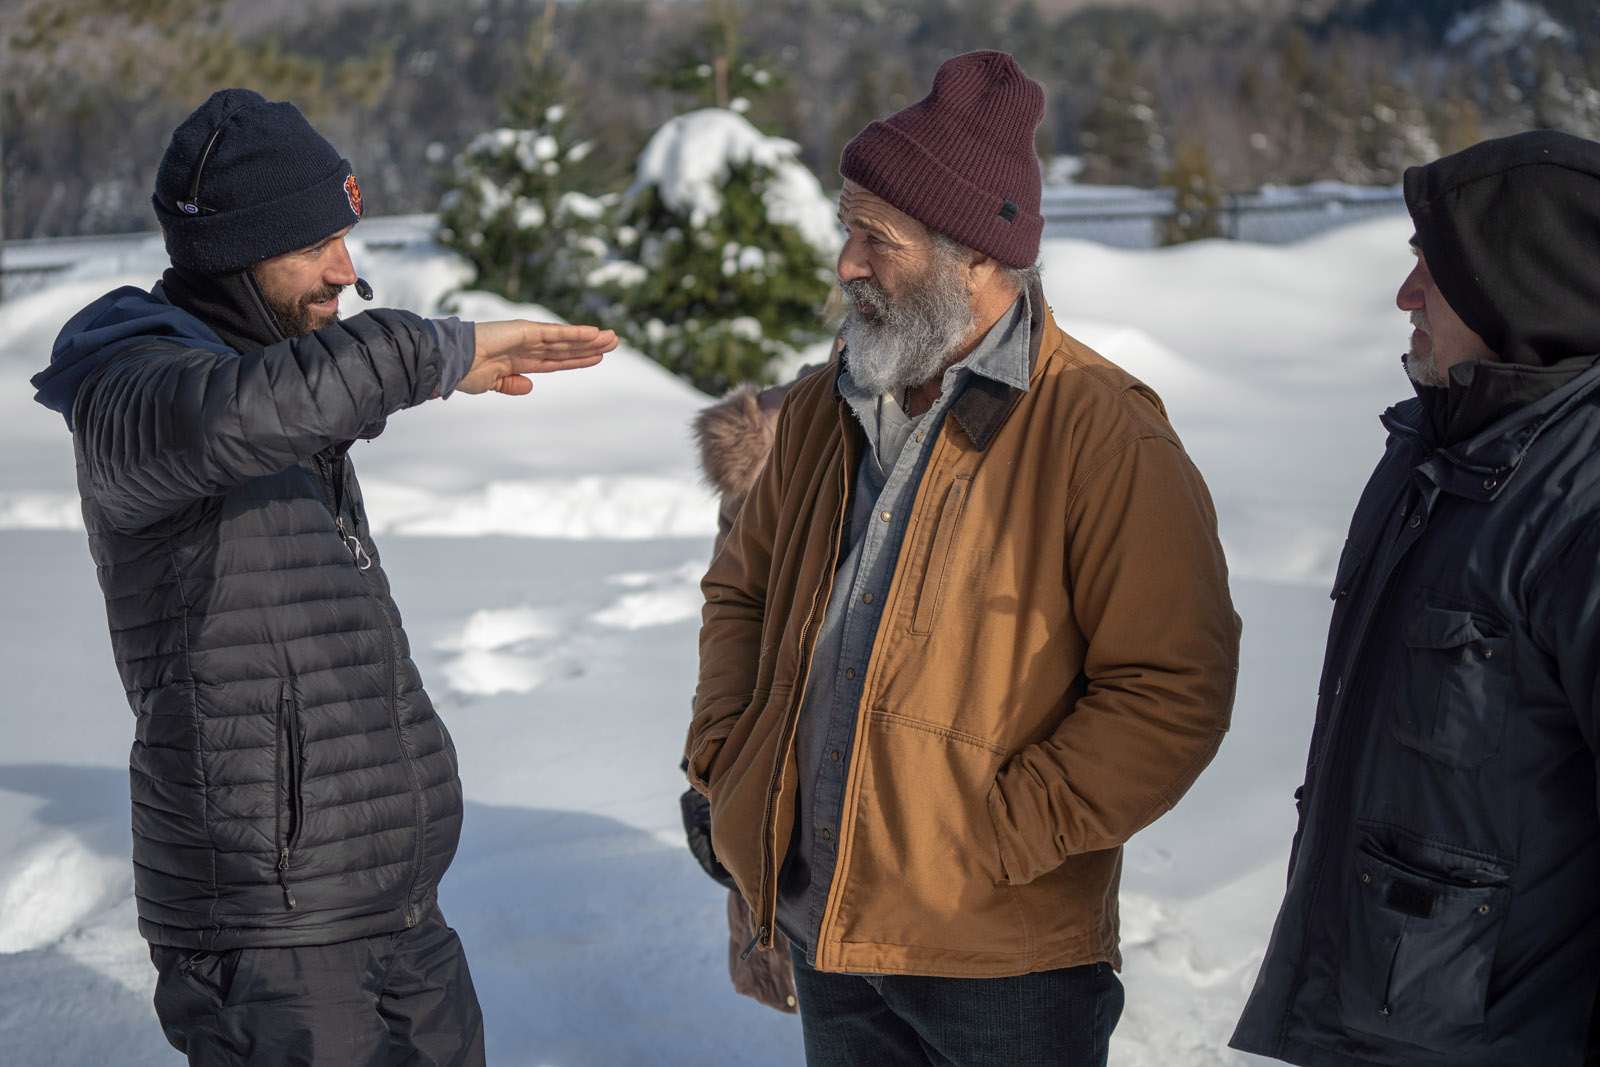 DP Johnny Derango (left) during filming holiday film Fatman